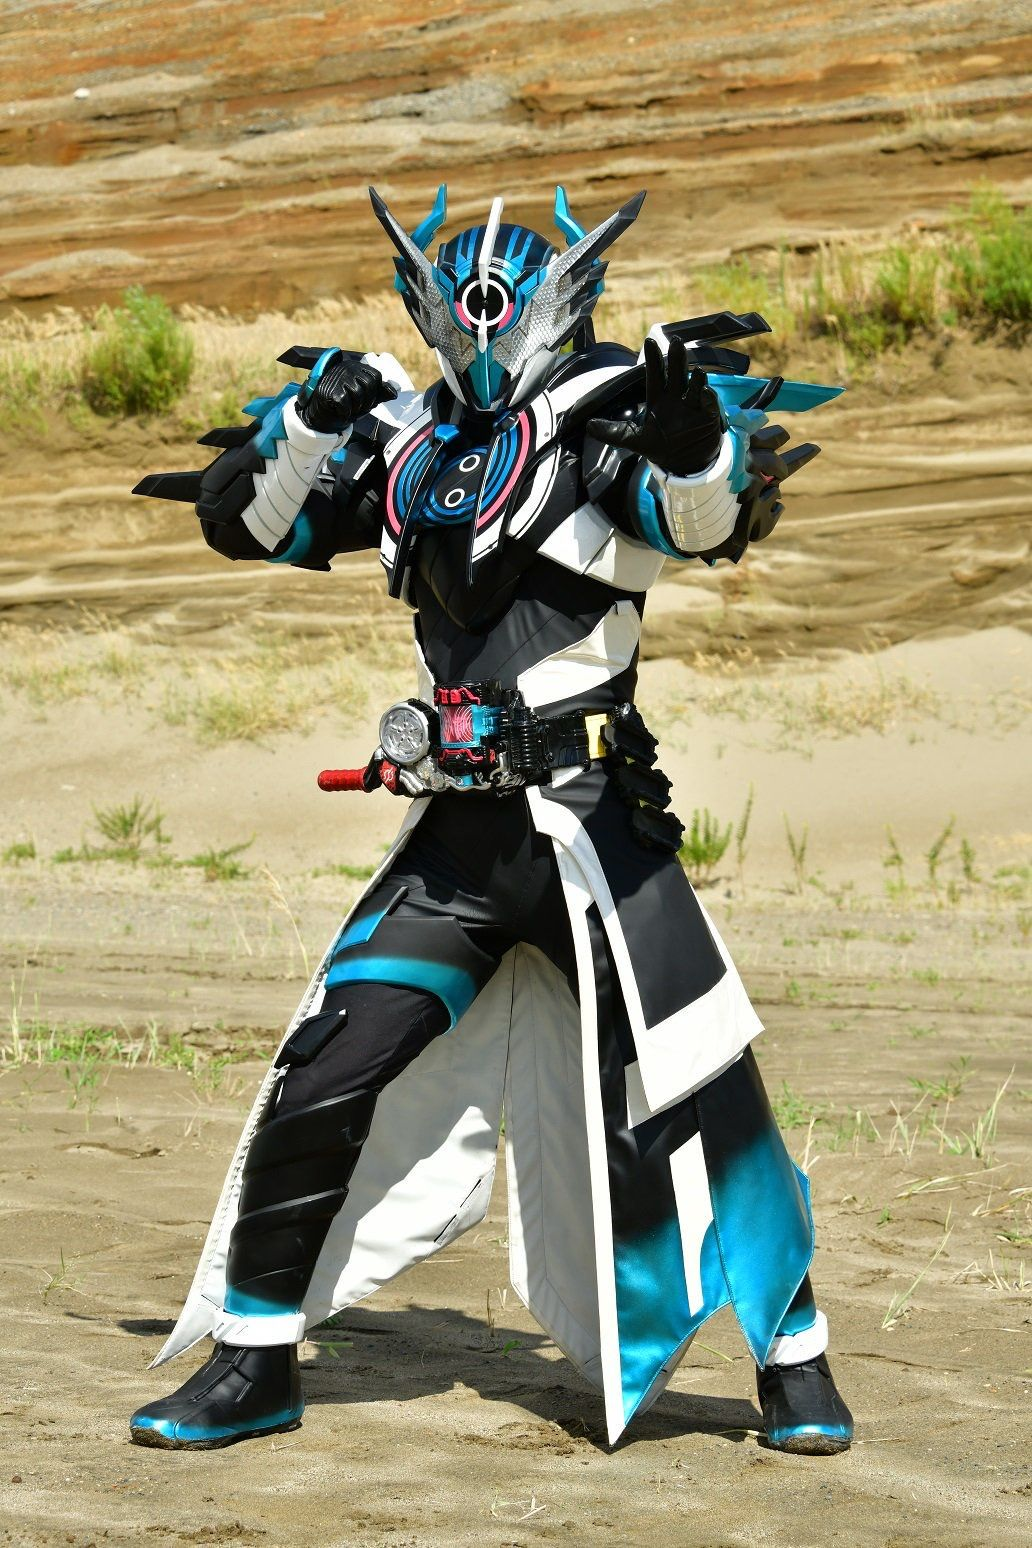 Kamen Rider CrossZEvol Kamen rider, Kamen rider decade